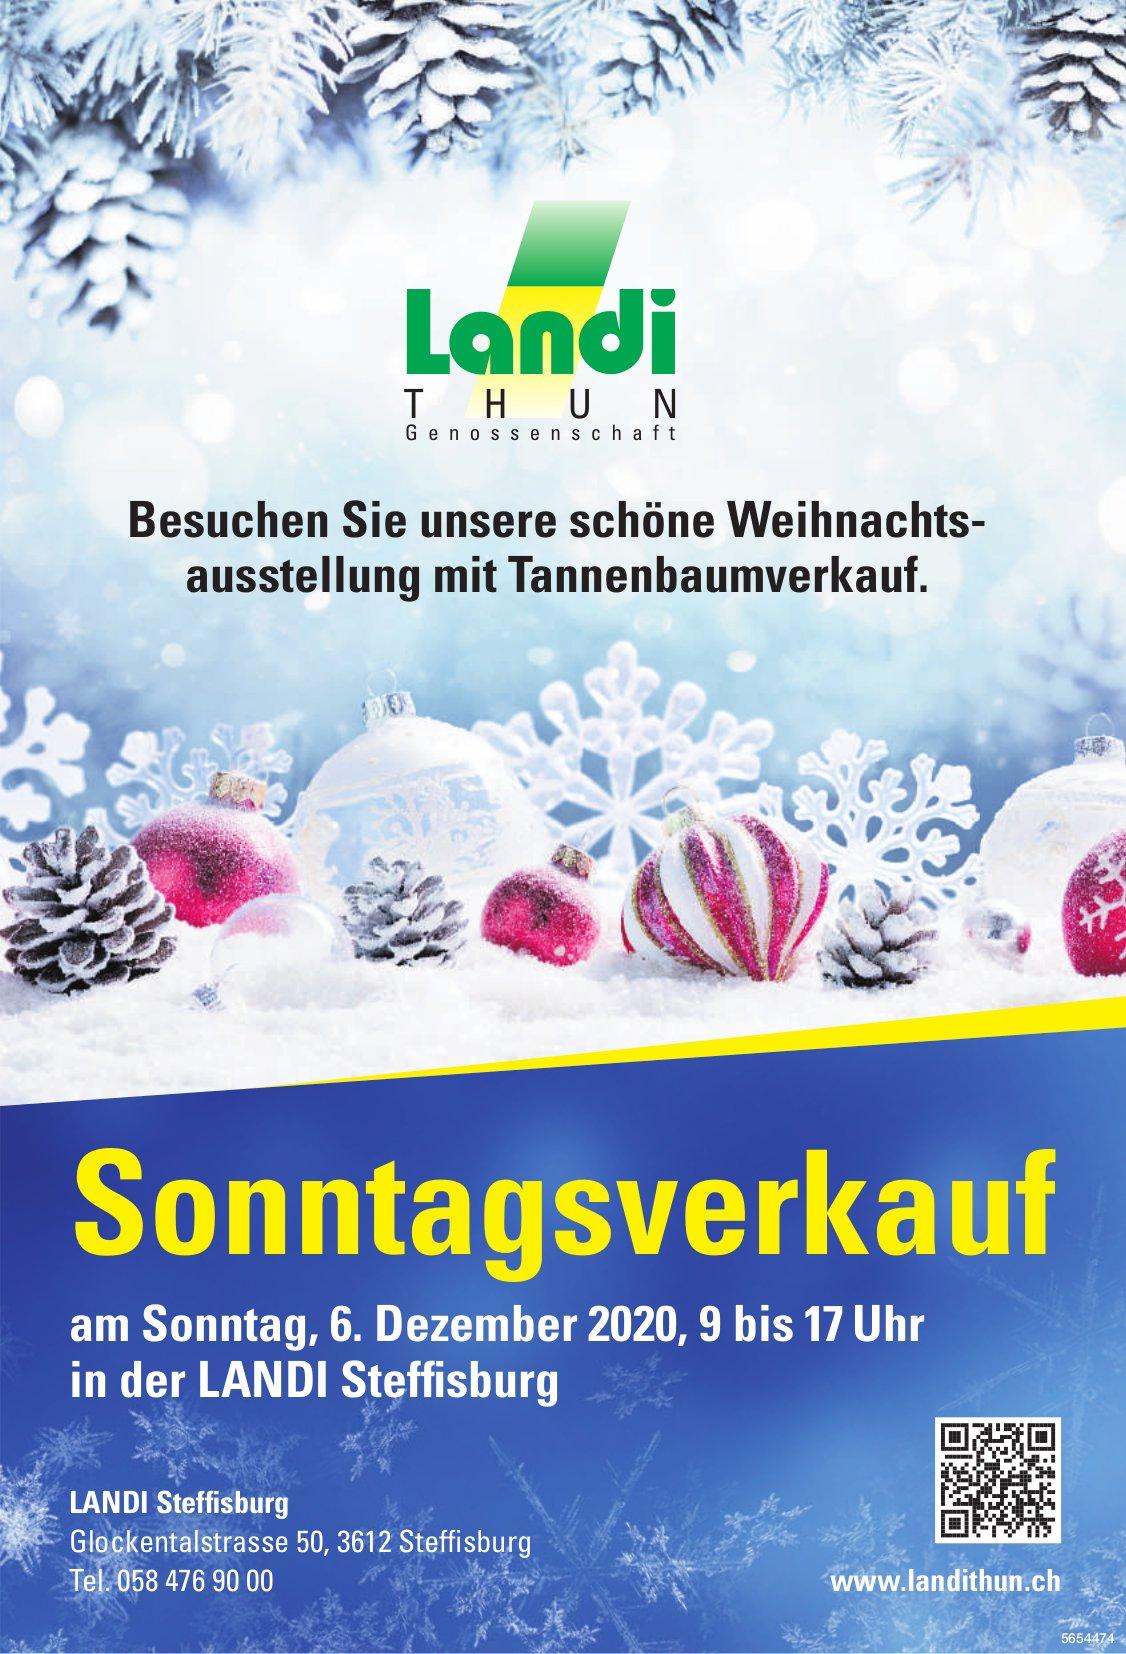 Landi Steffisburg - Sonntagsverkauf, 6. Dezember